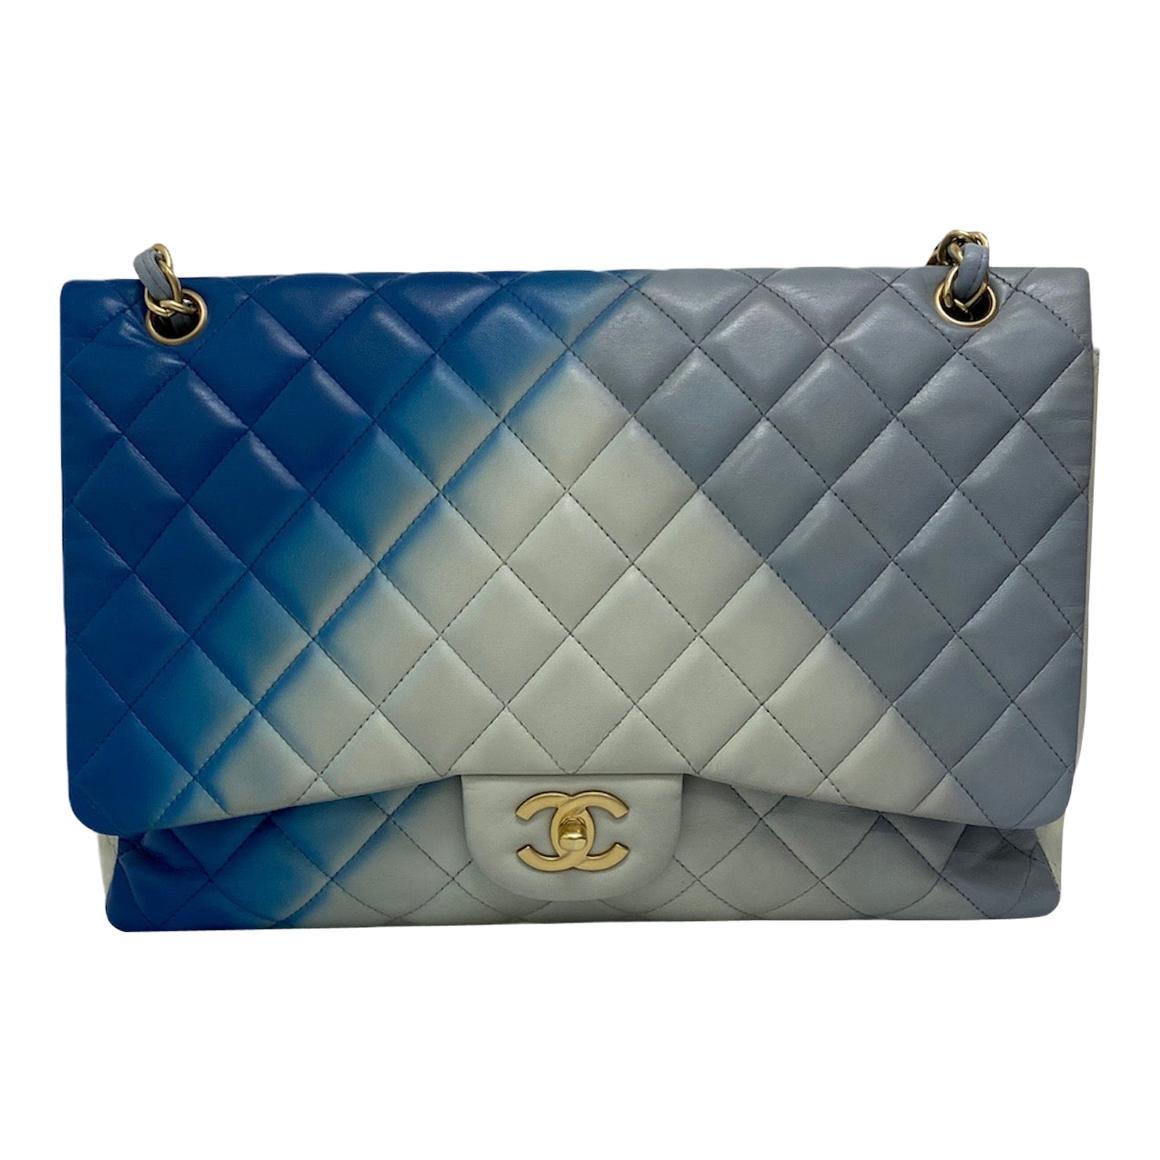 Chanel Blue Leather Maxi Jumbo Bag